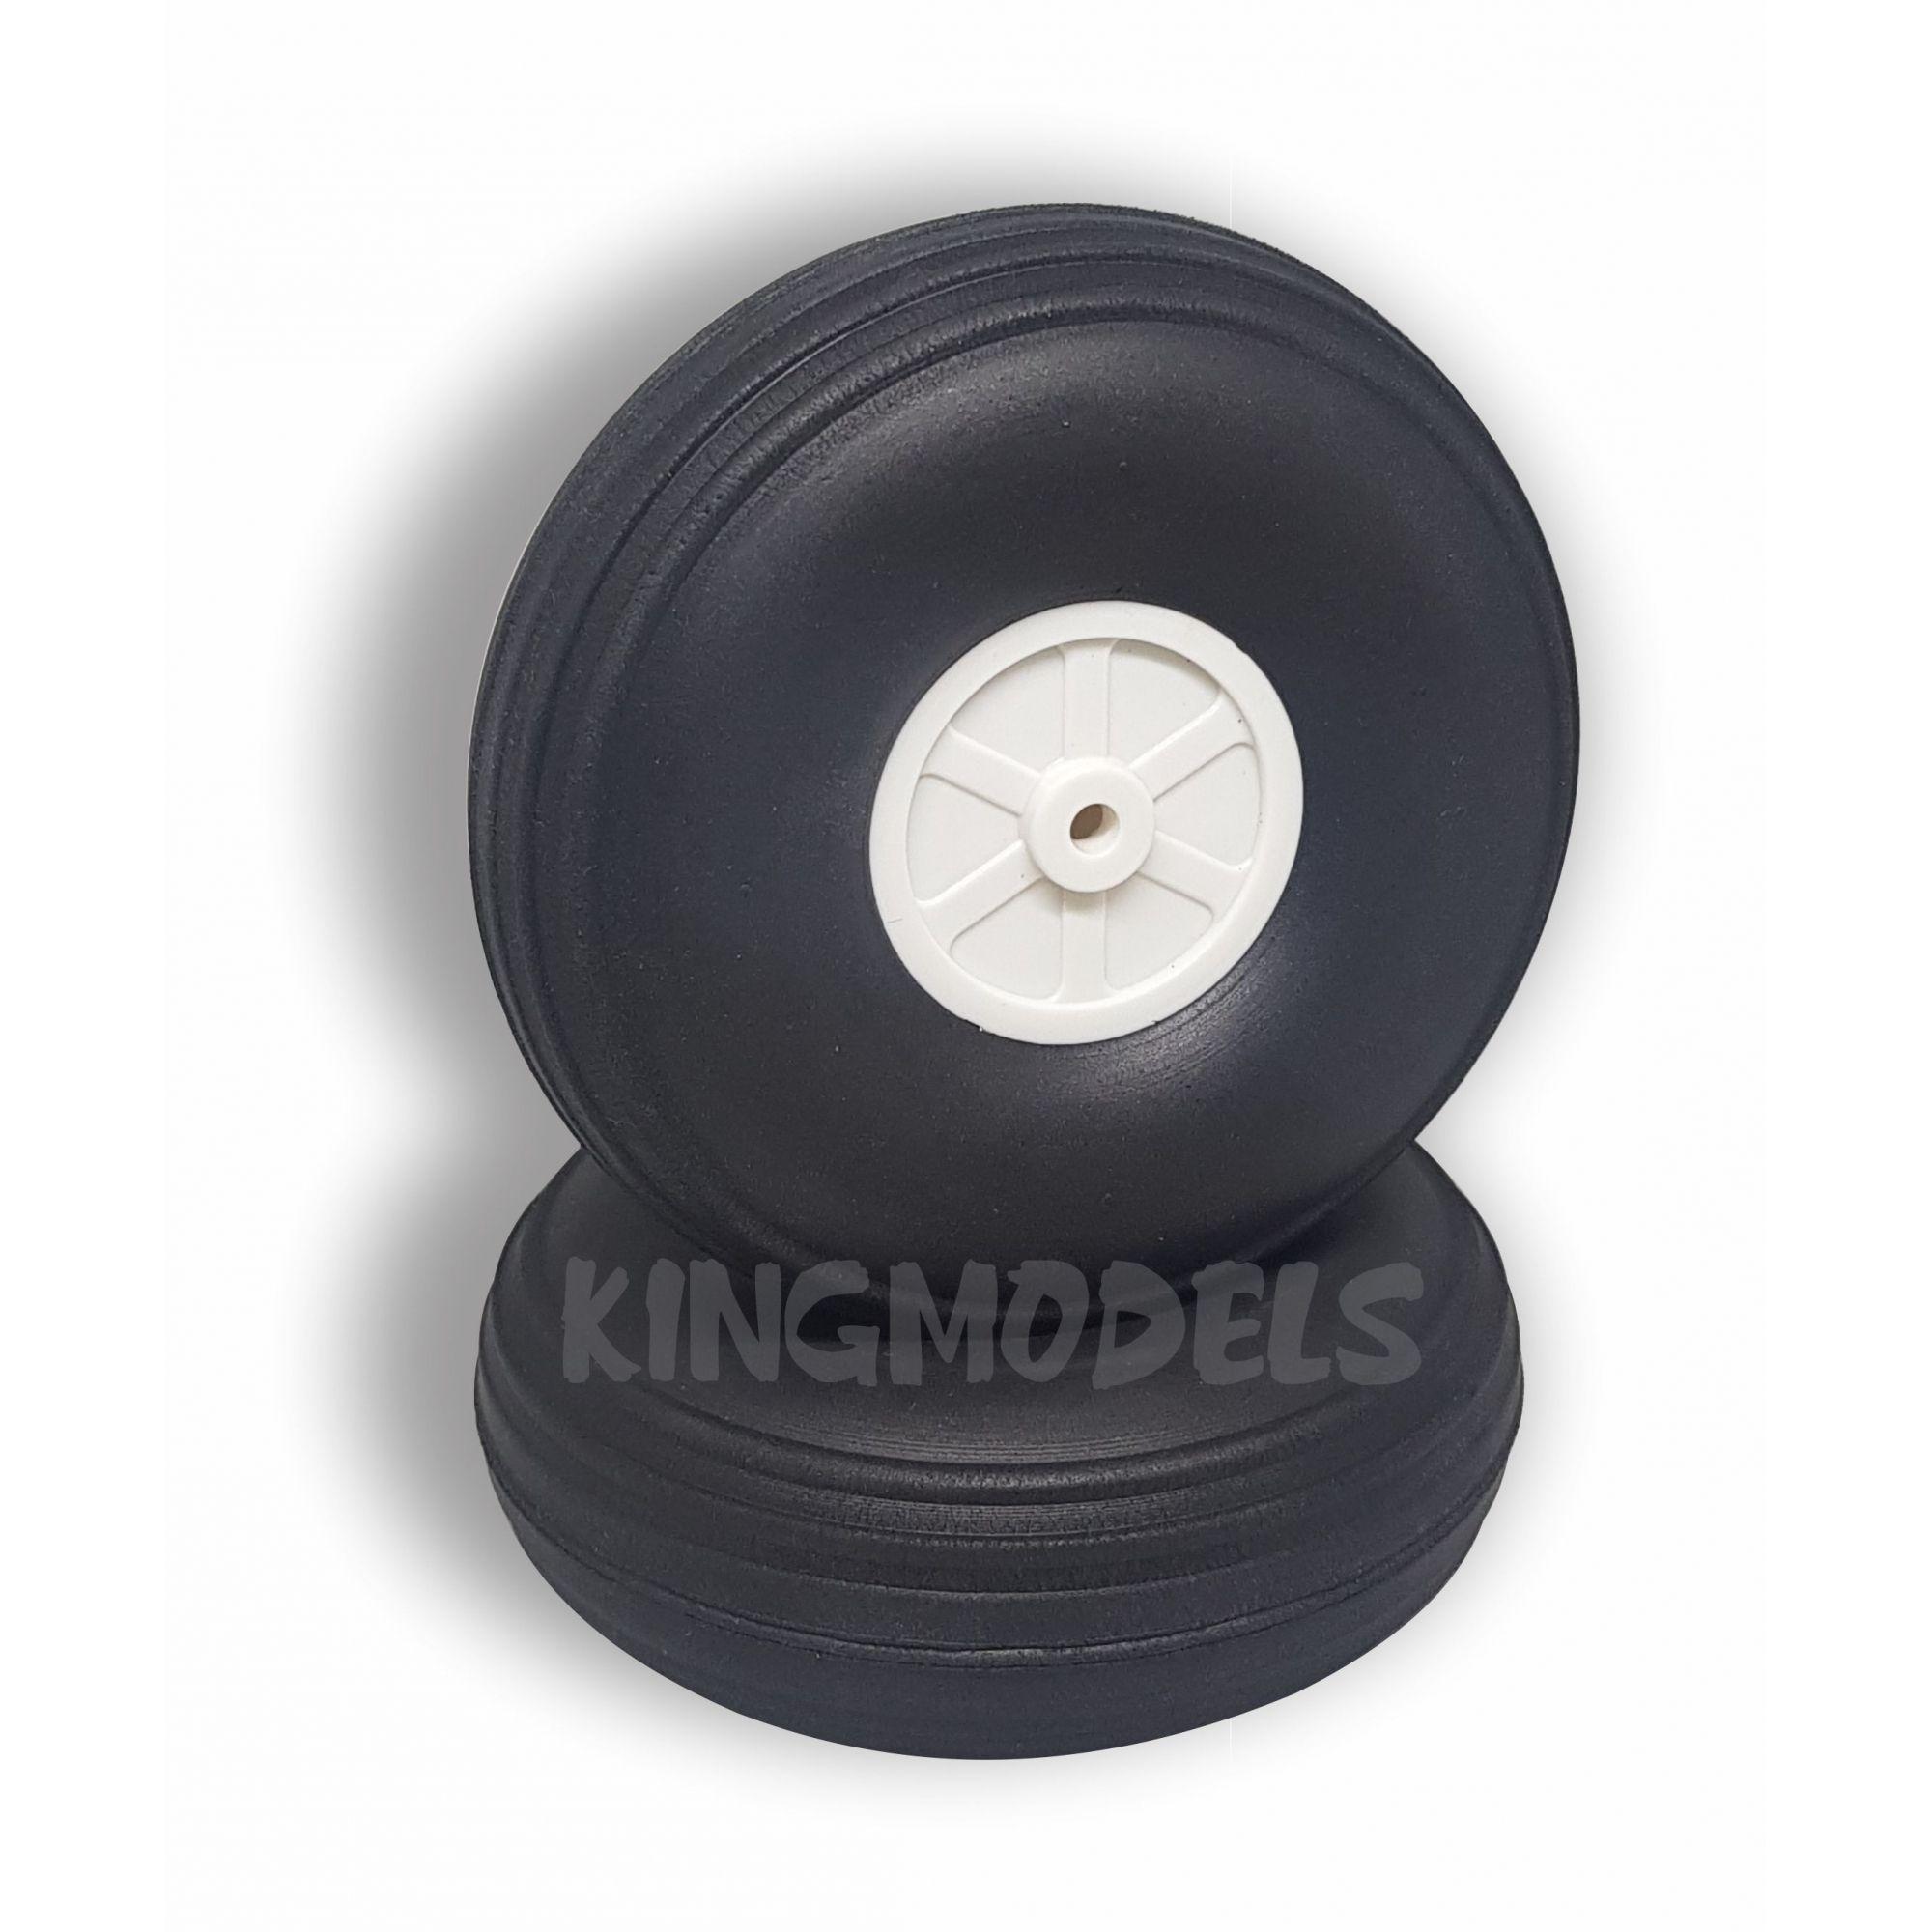 Roda De Borracha Extra-leve E Cubo Nylon-70mm-Aerodinâmica (2pçs)  - King Models